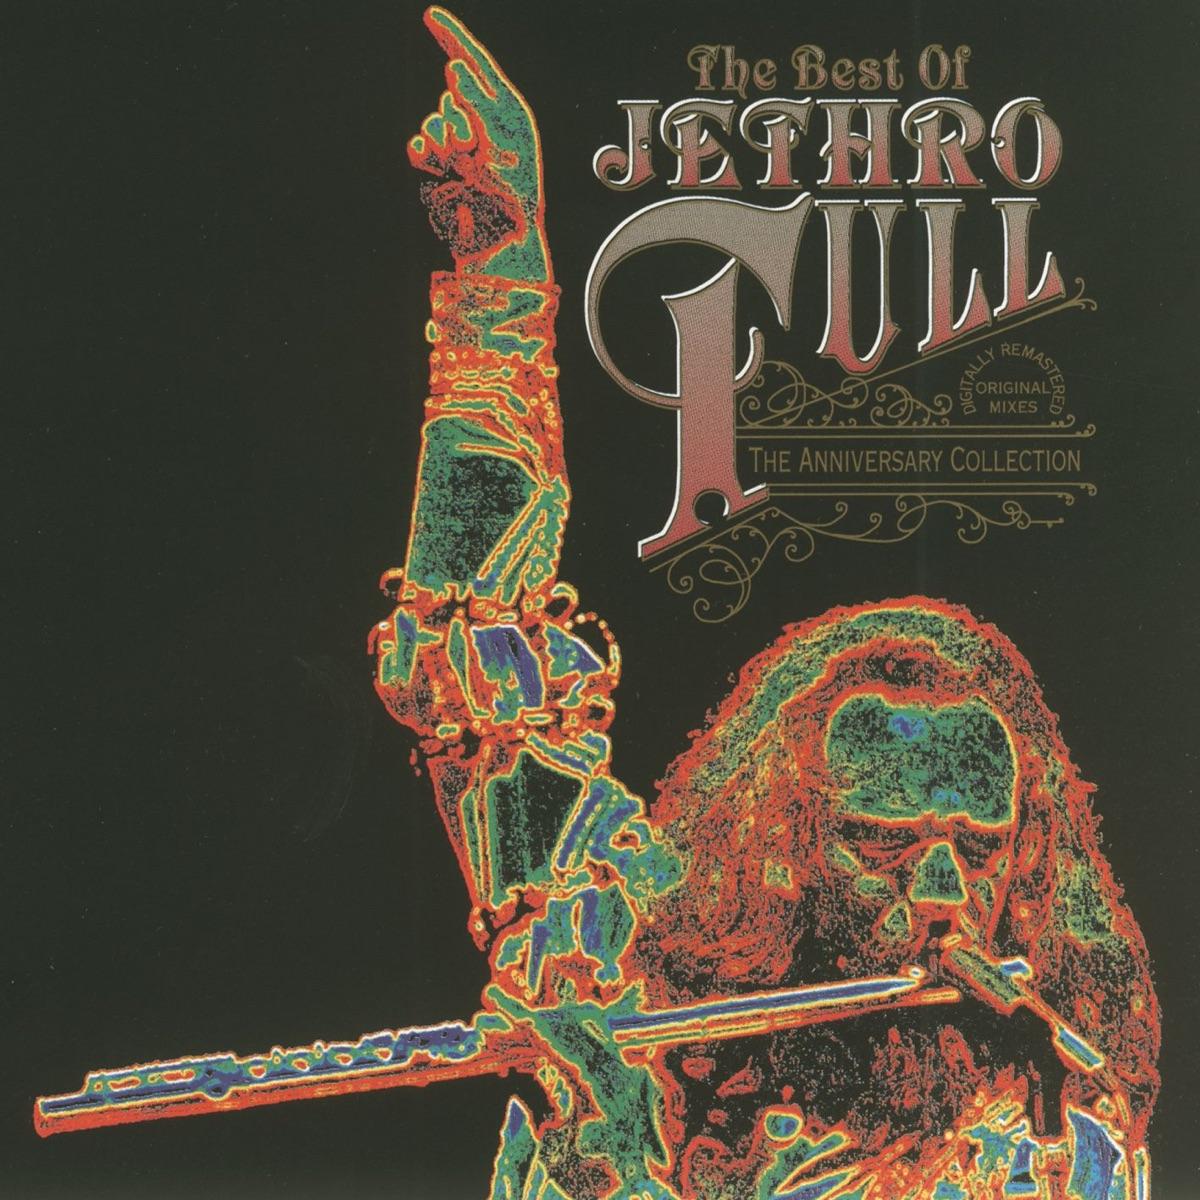 The Best of Jethro Tull Album Cover by Jethro Tull